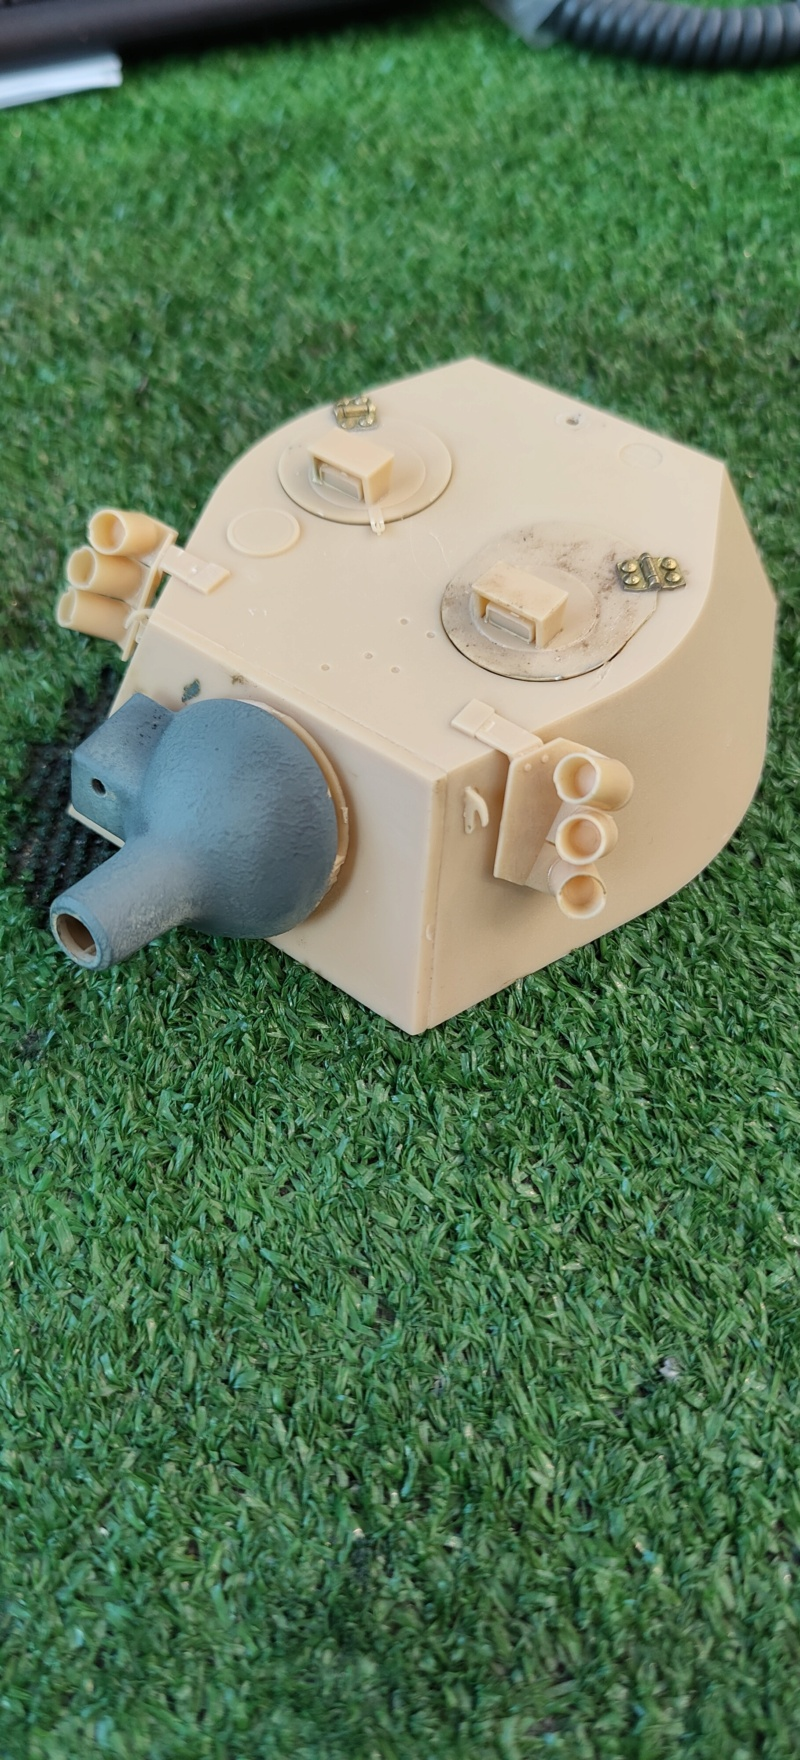 Puma Sd.Kfz. 234/2 Metal Origin 1:16 WIP - Pagina 2 Img20274